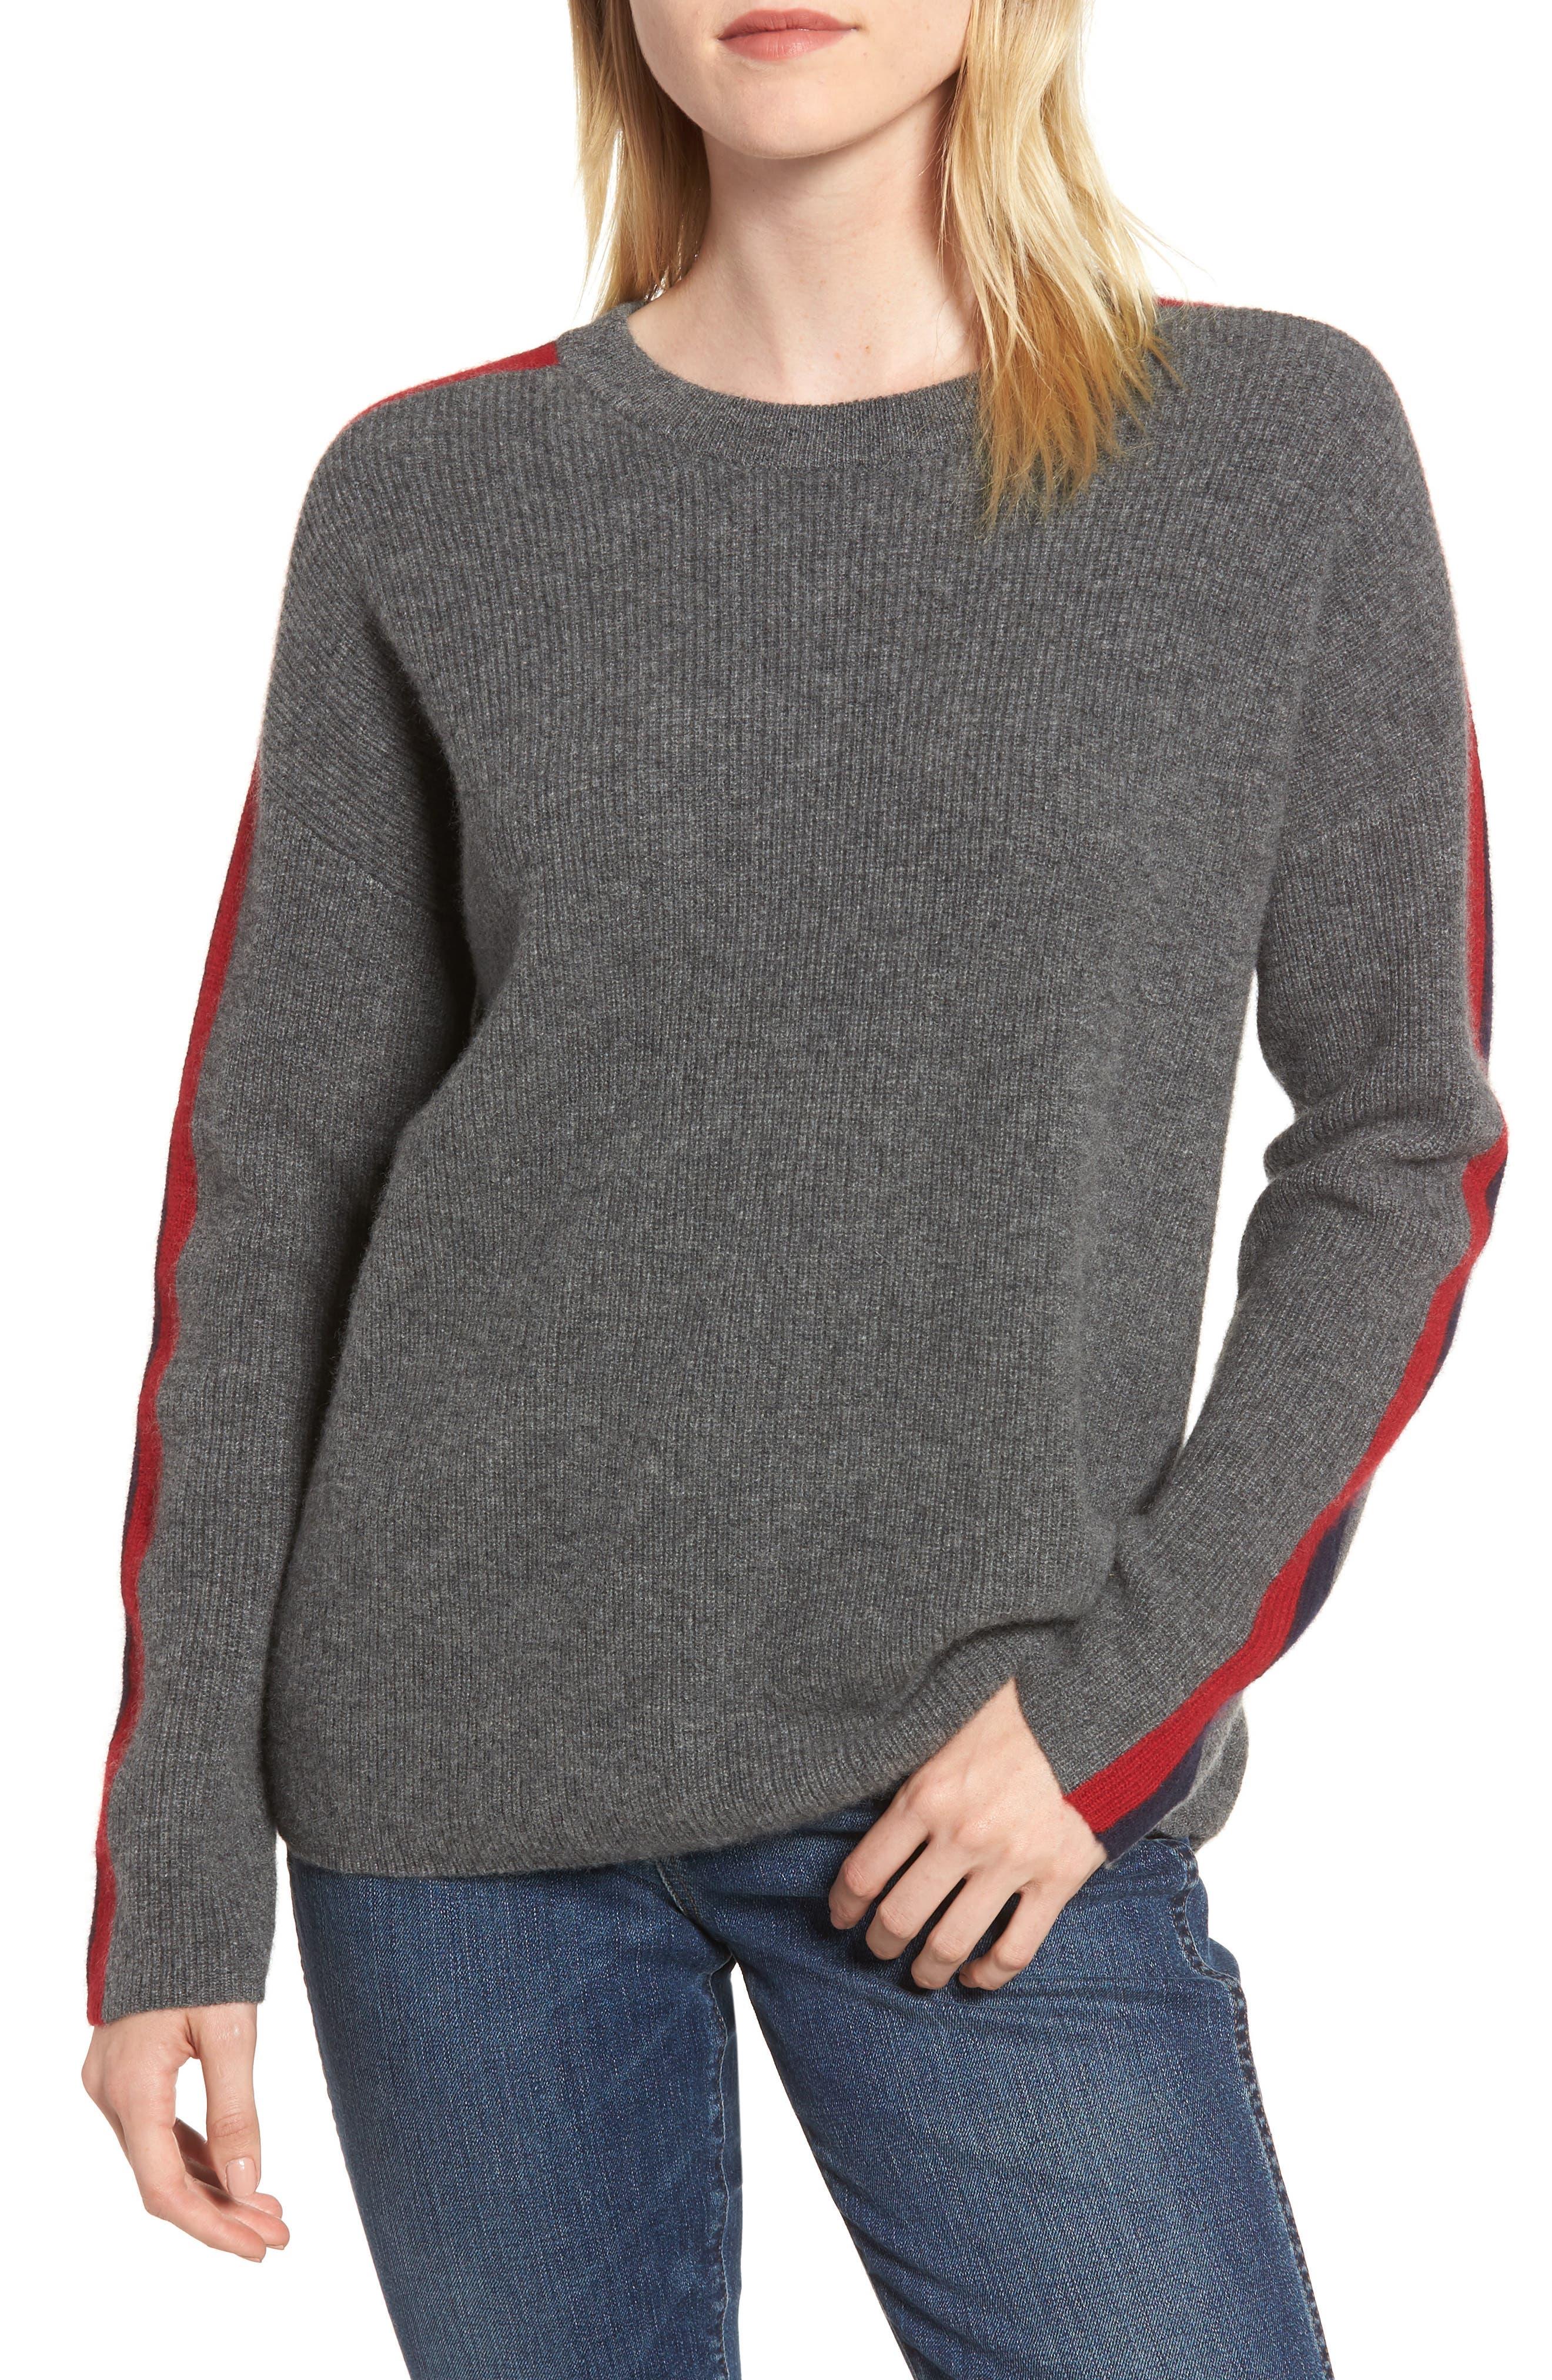 VELVET BY GRAHAM & SPENCER Stripe Sleeve Cashmere Sweater, Main, color, DARK GREY